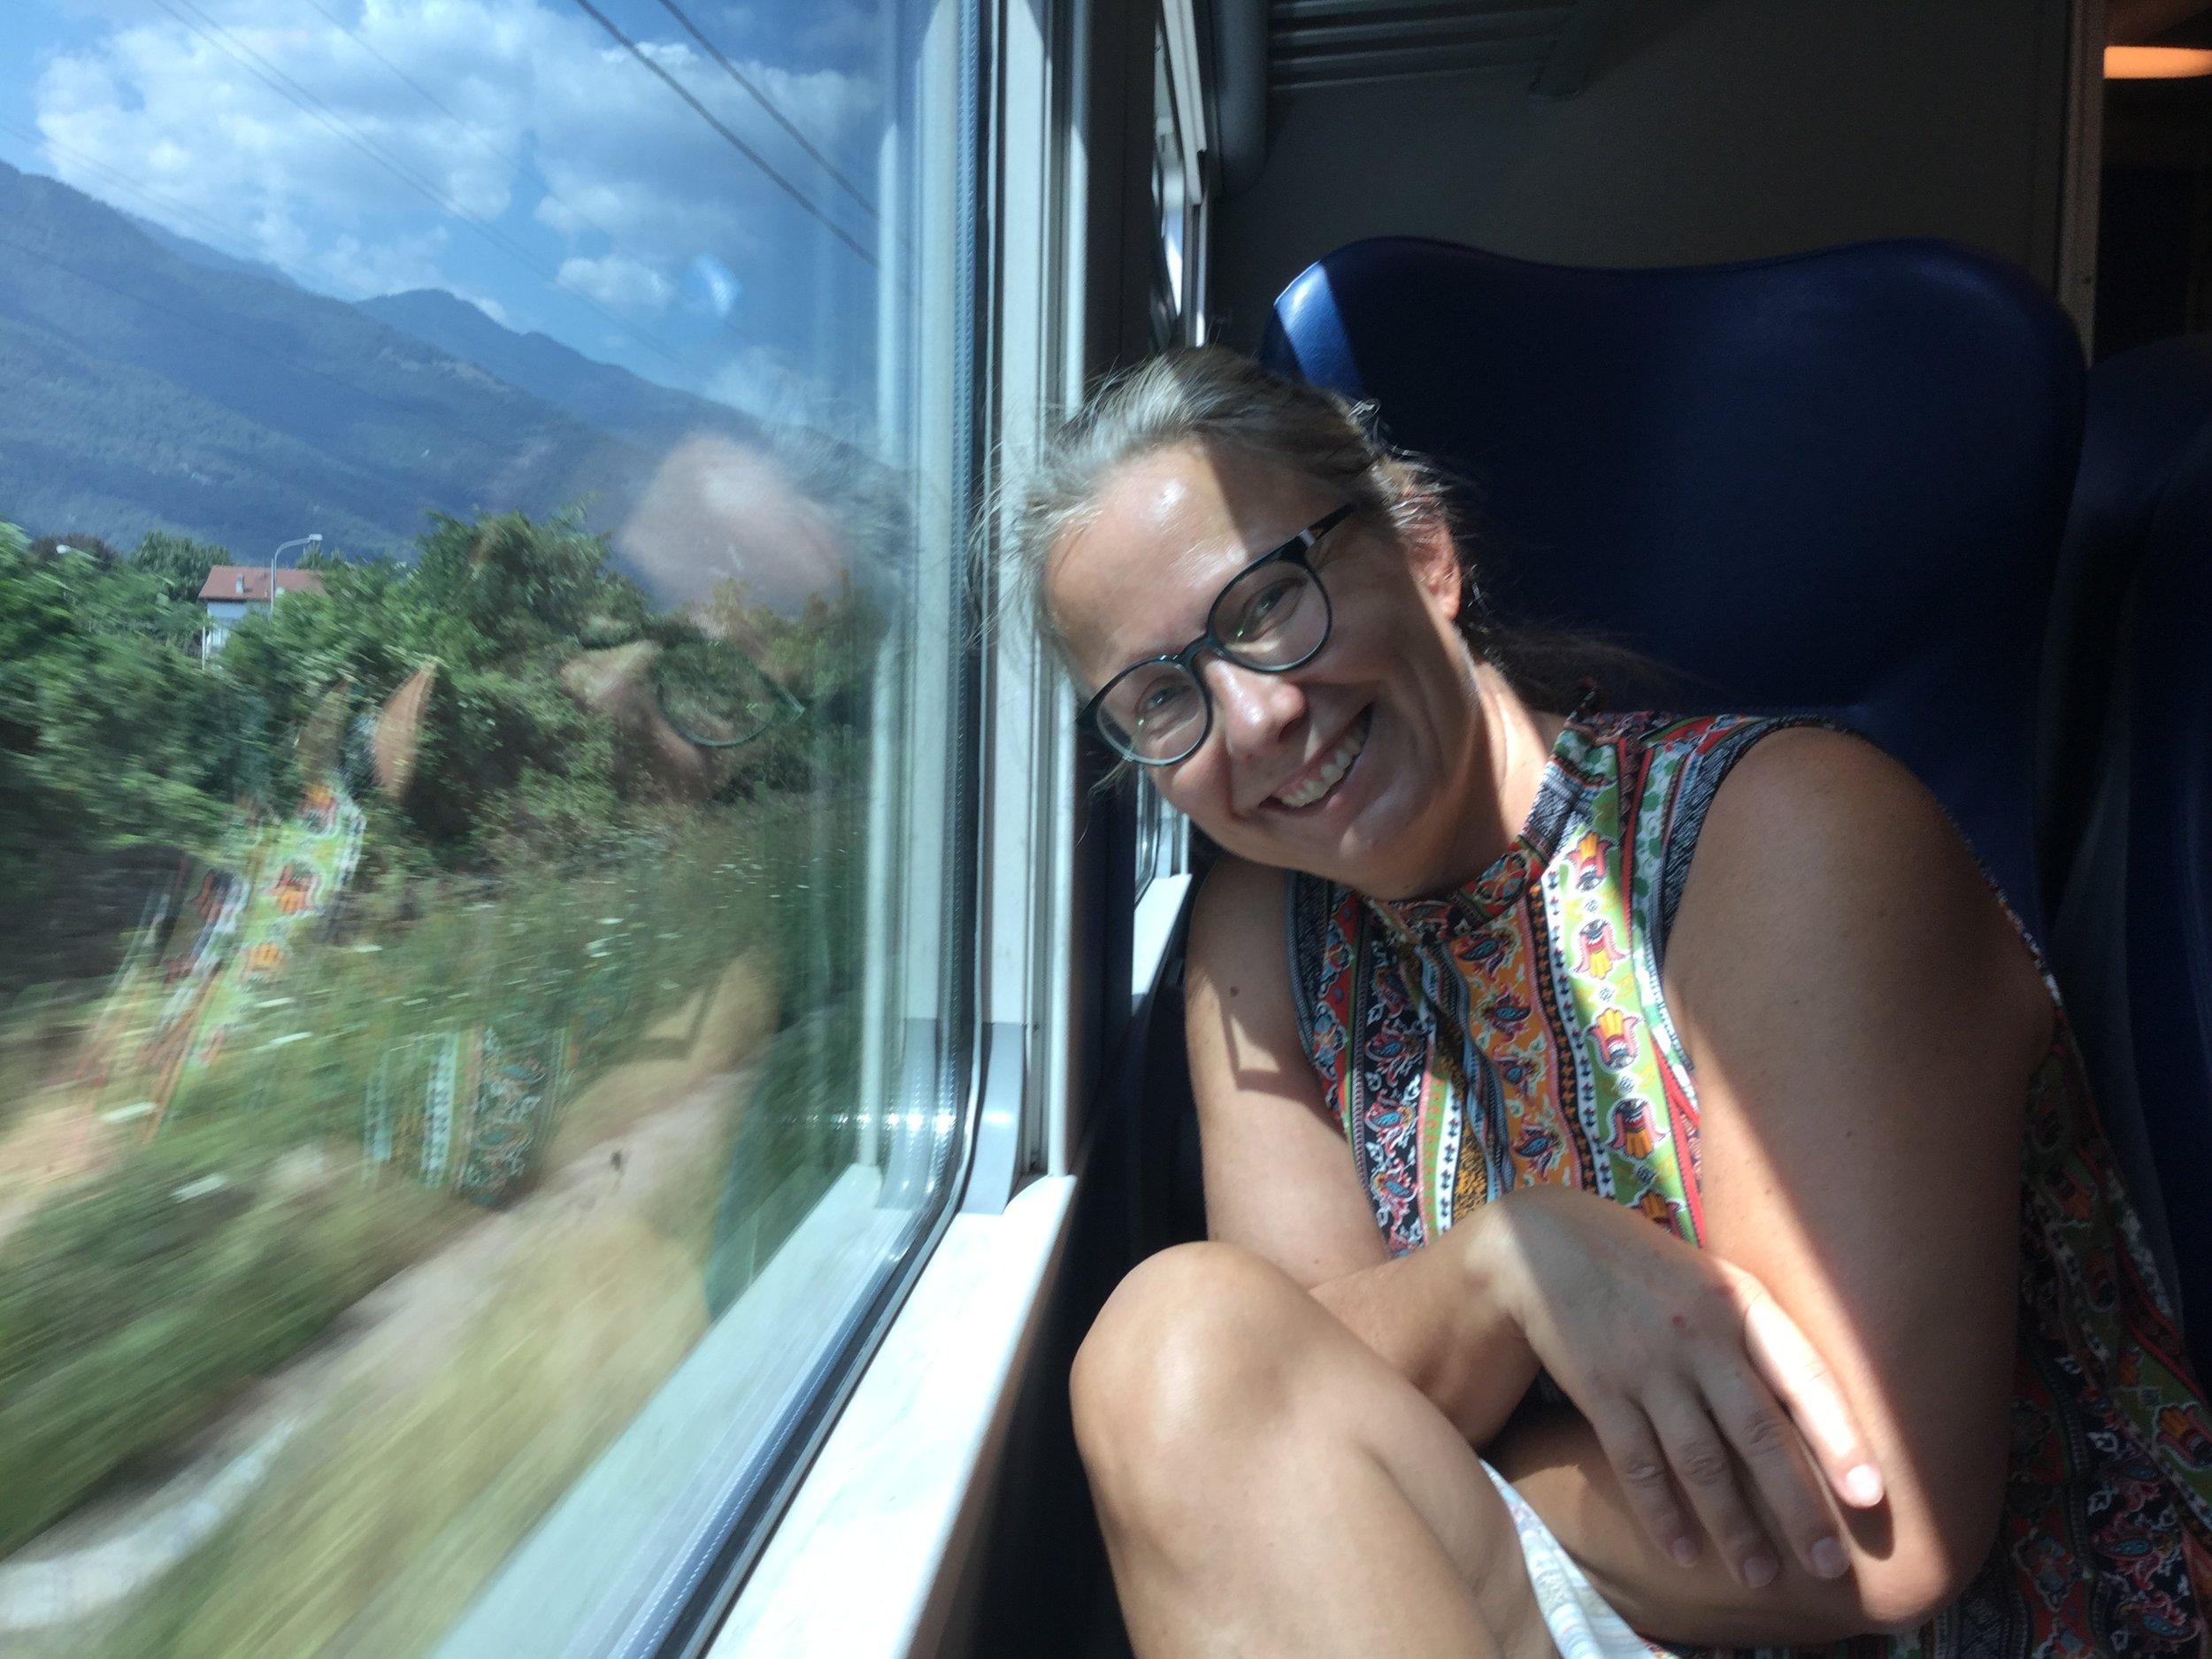 Italian trains are nice.